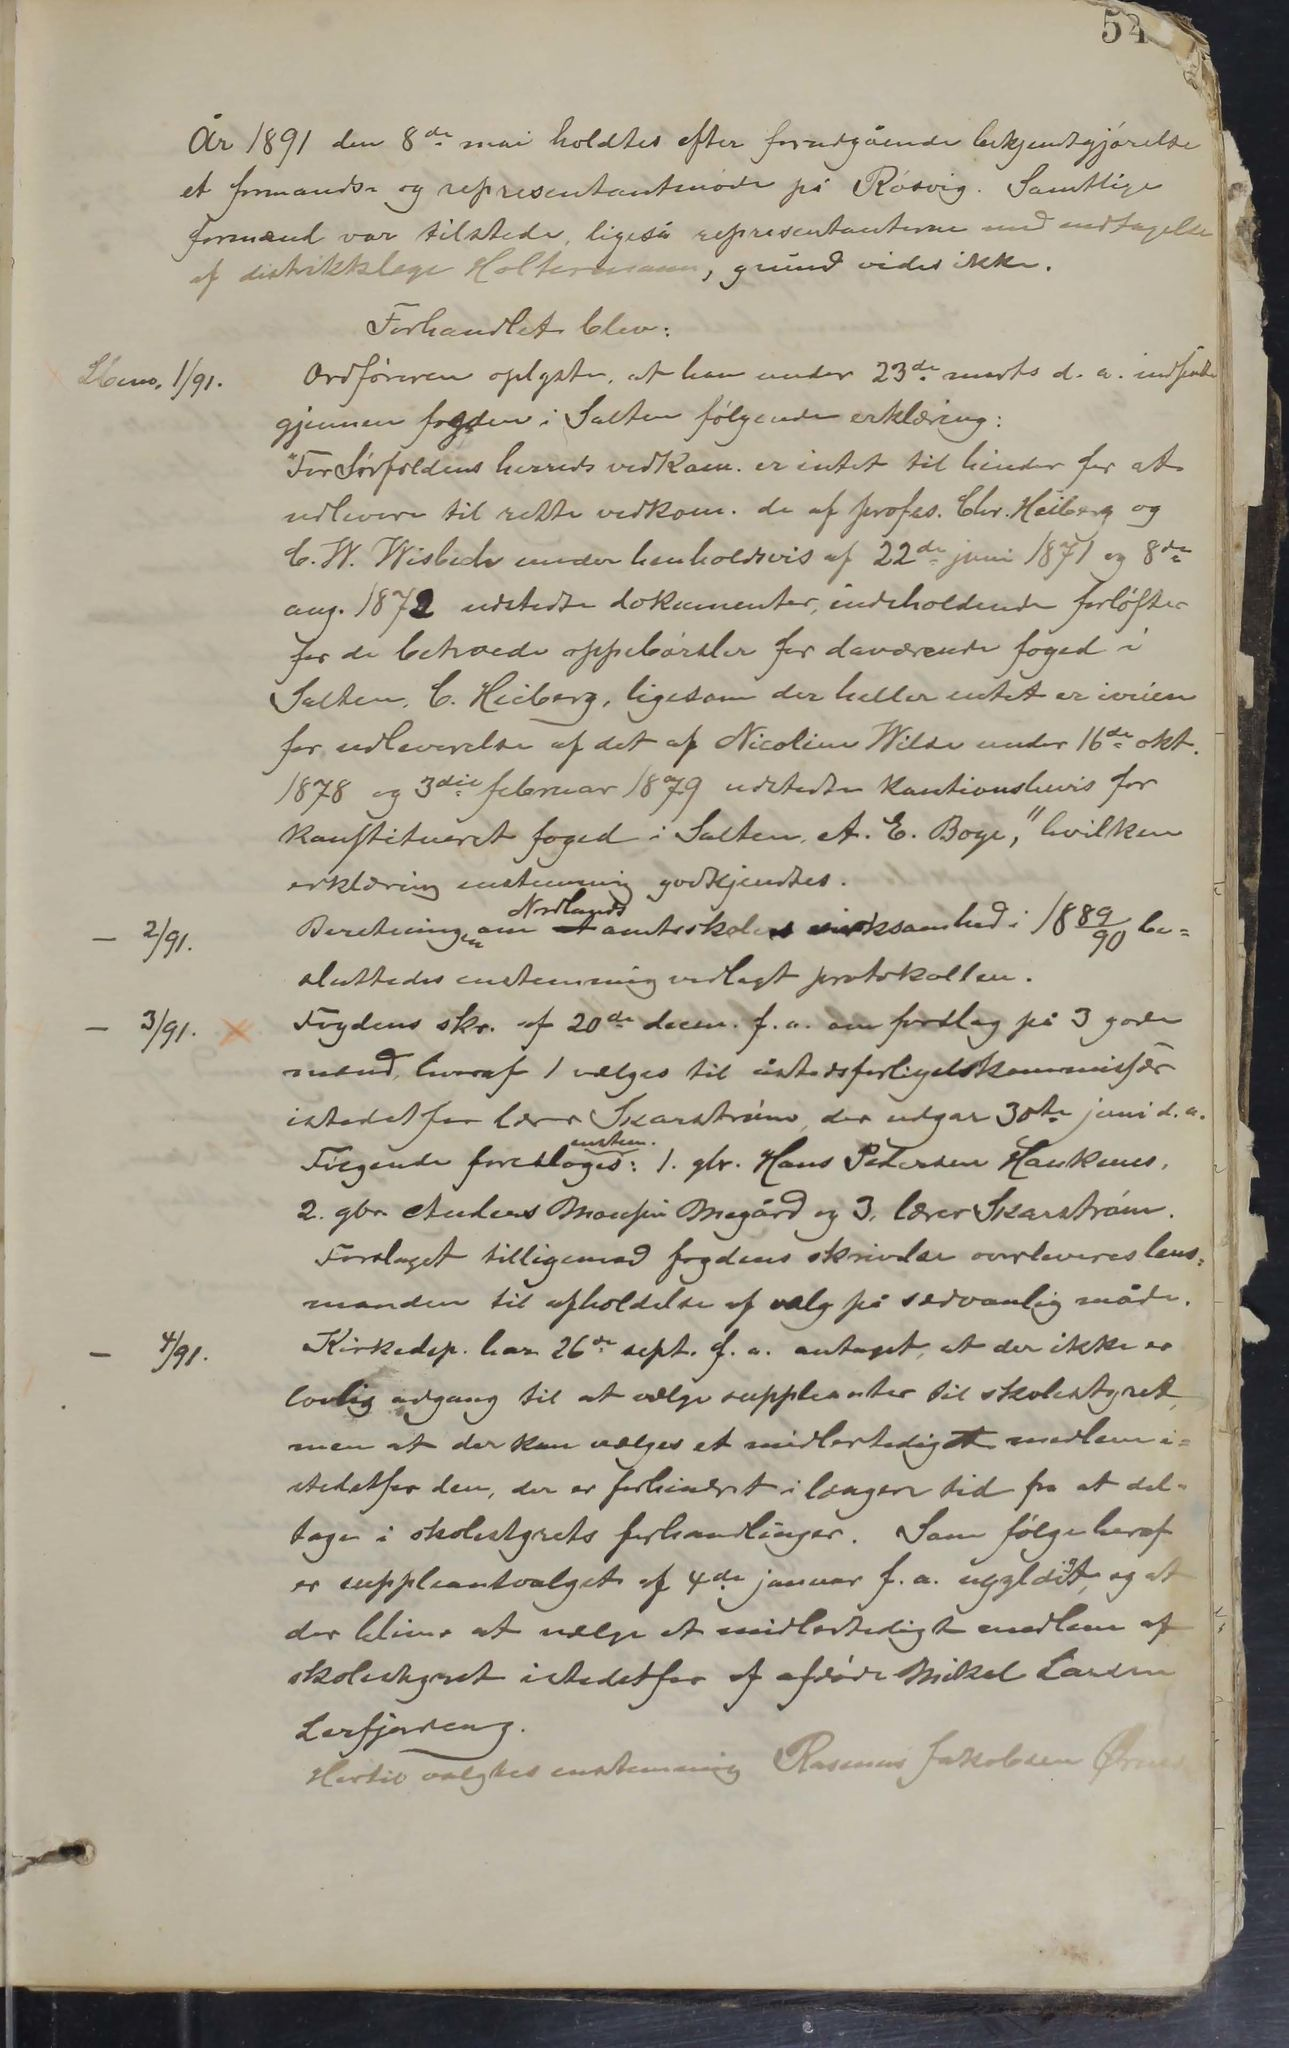 AIN, Sørfold kommune. Formannskap, 100/L0001: Forhandlingsprotokol for Sørfoldens formandskab, 1885-1902, s. 54